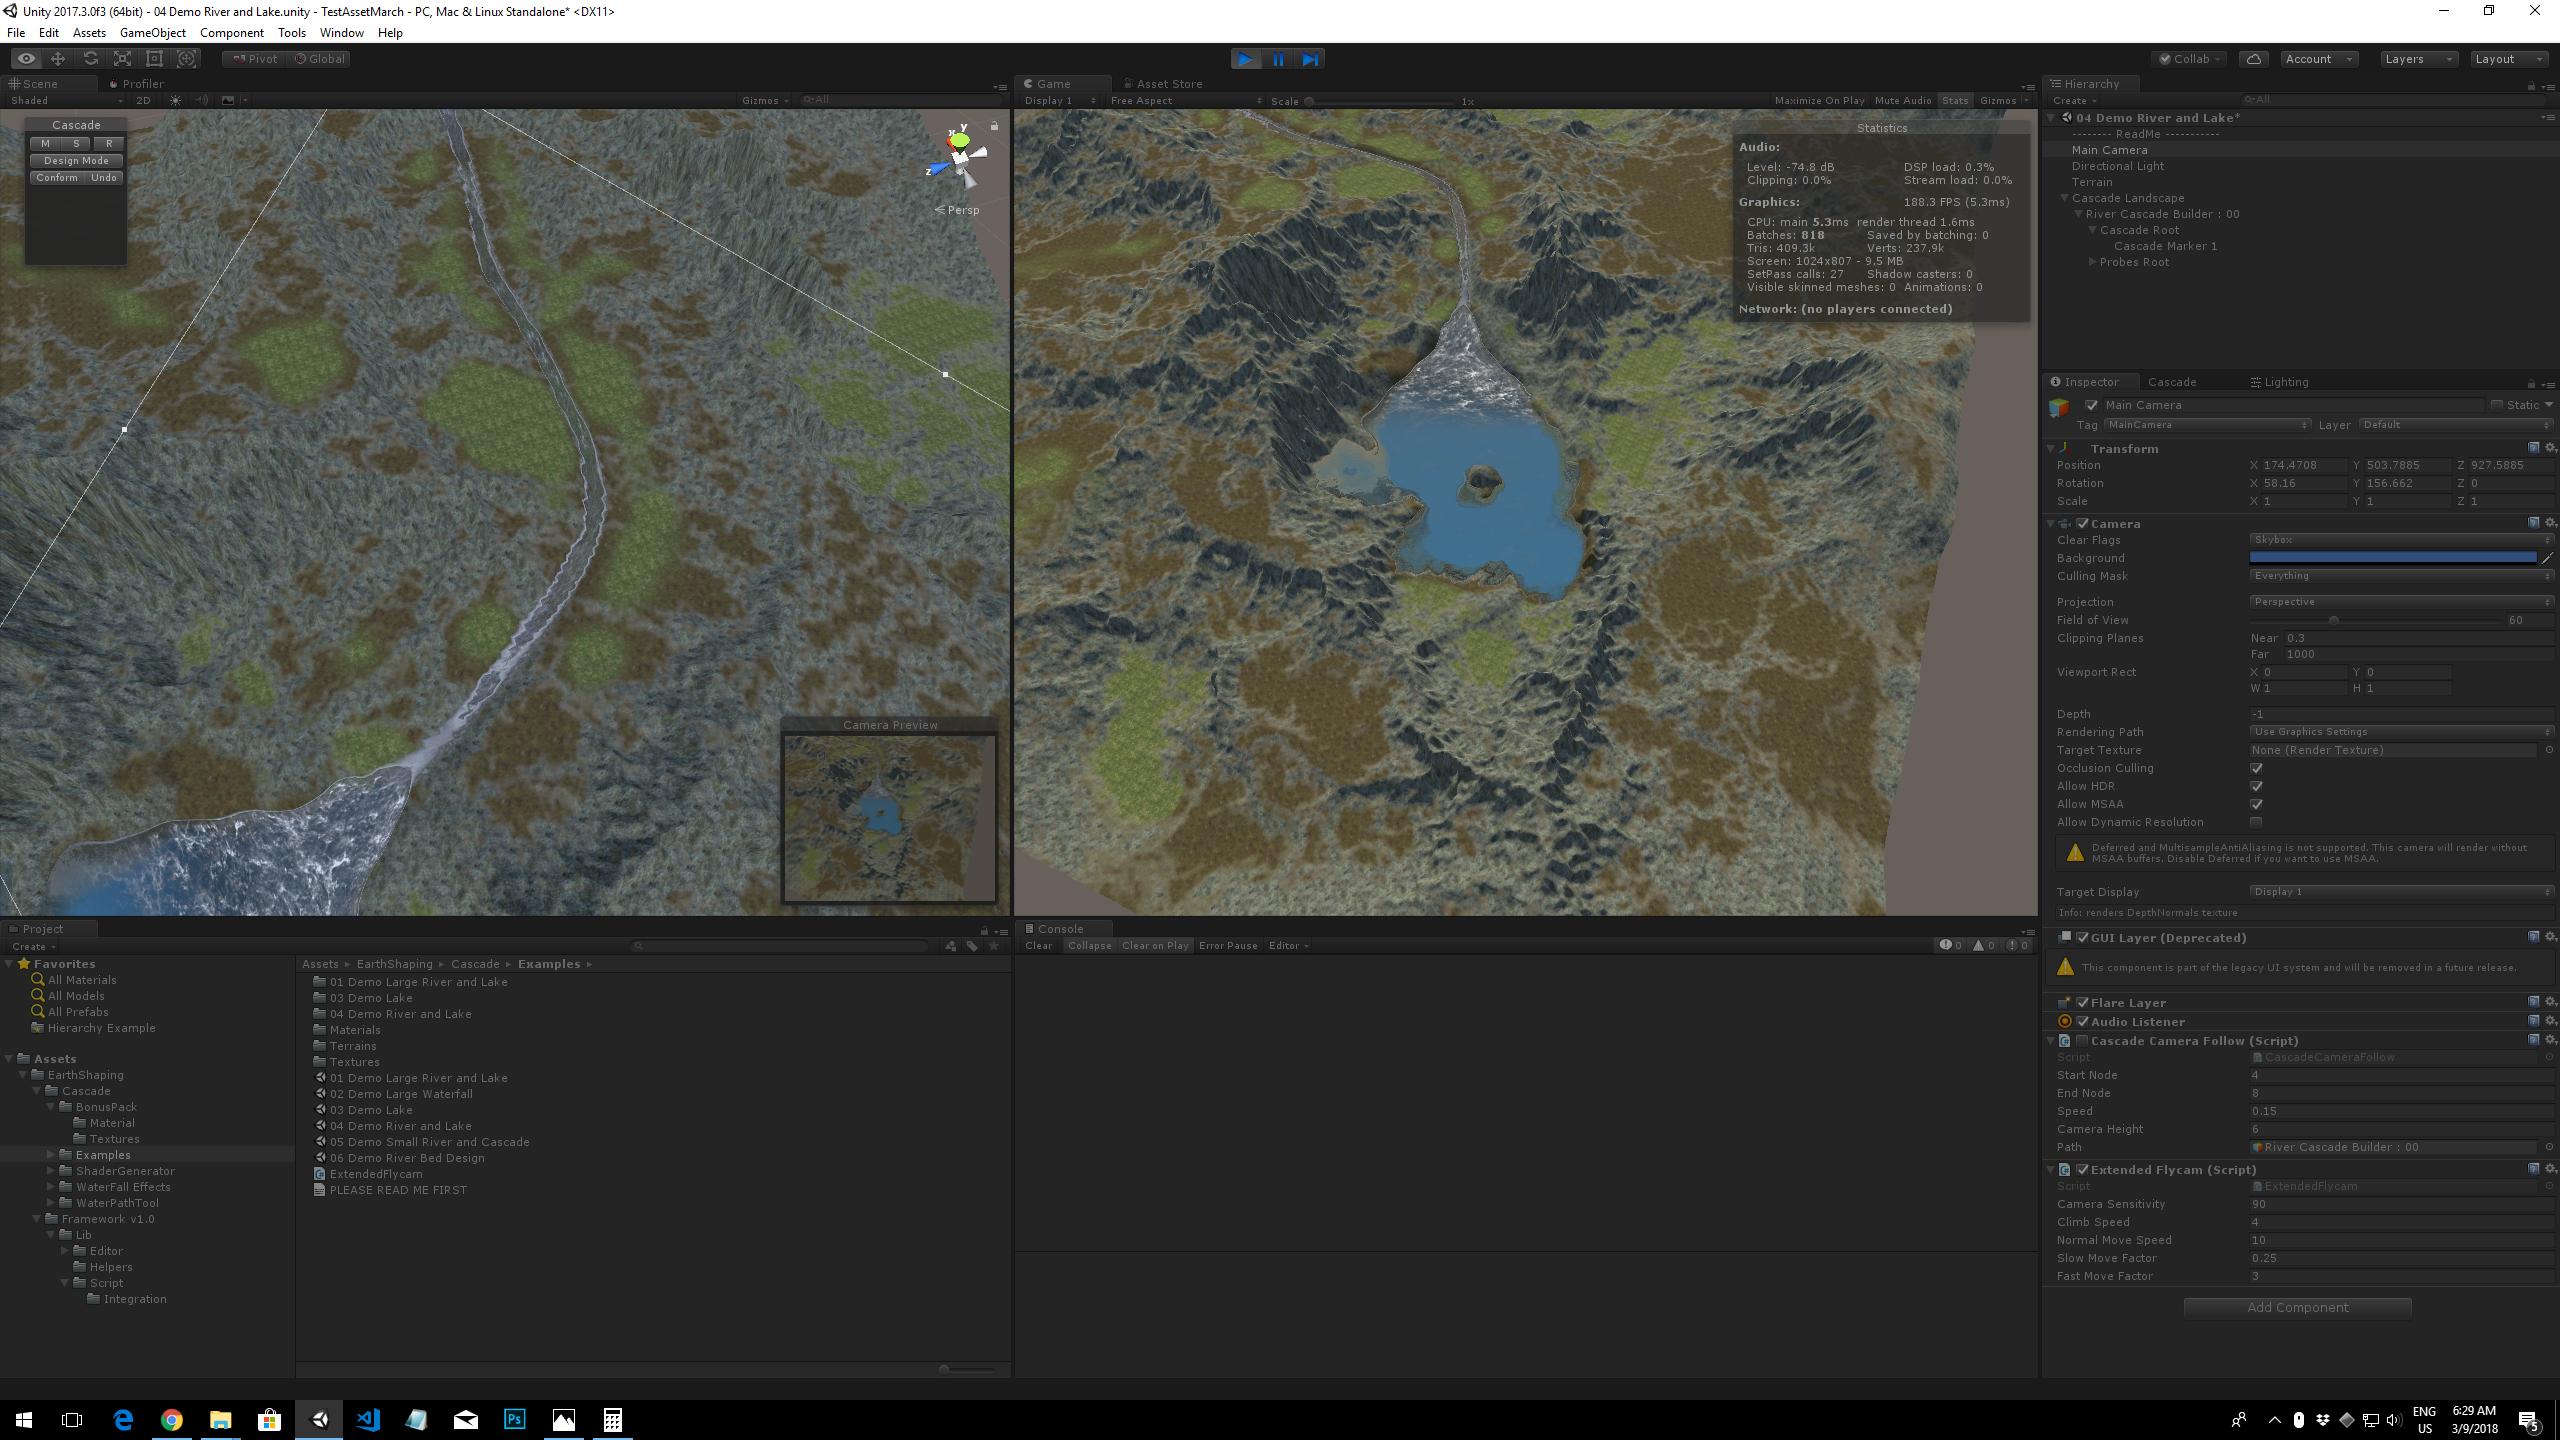 Desktop Screenshot 2018.03.09 - 06.29.31.53.png